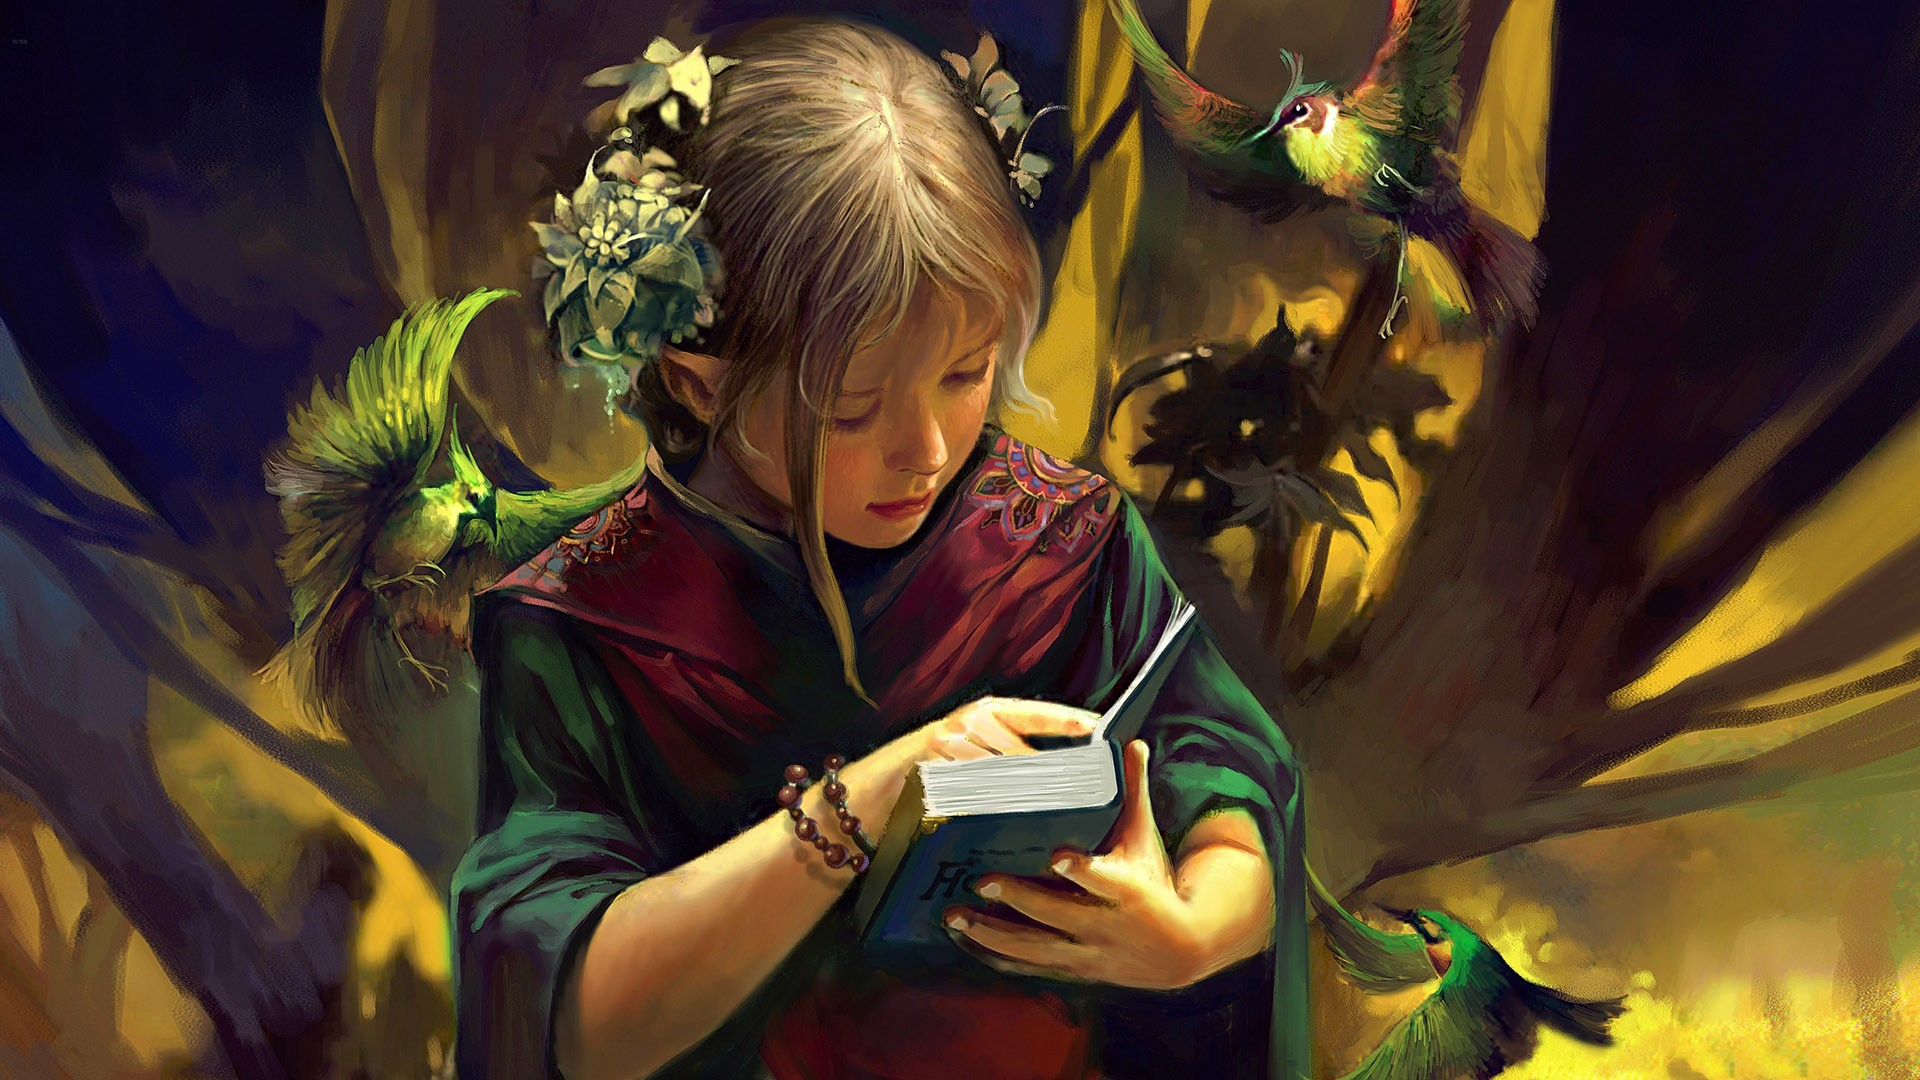 Фэнтези - Эльф  Elven ребенок Книга Птица Обои